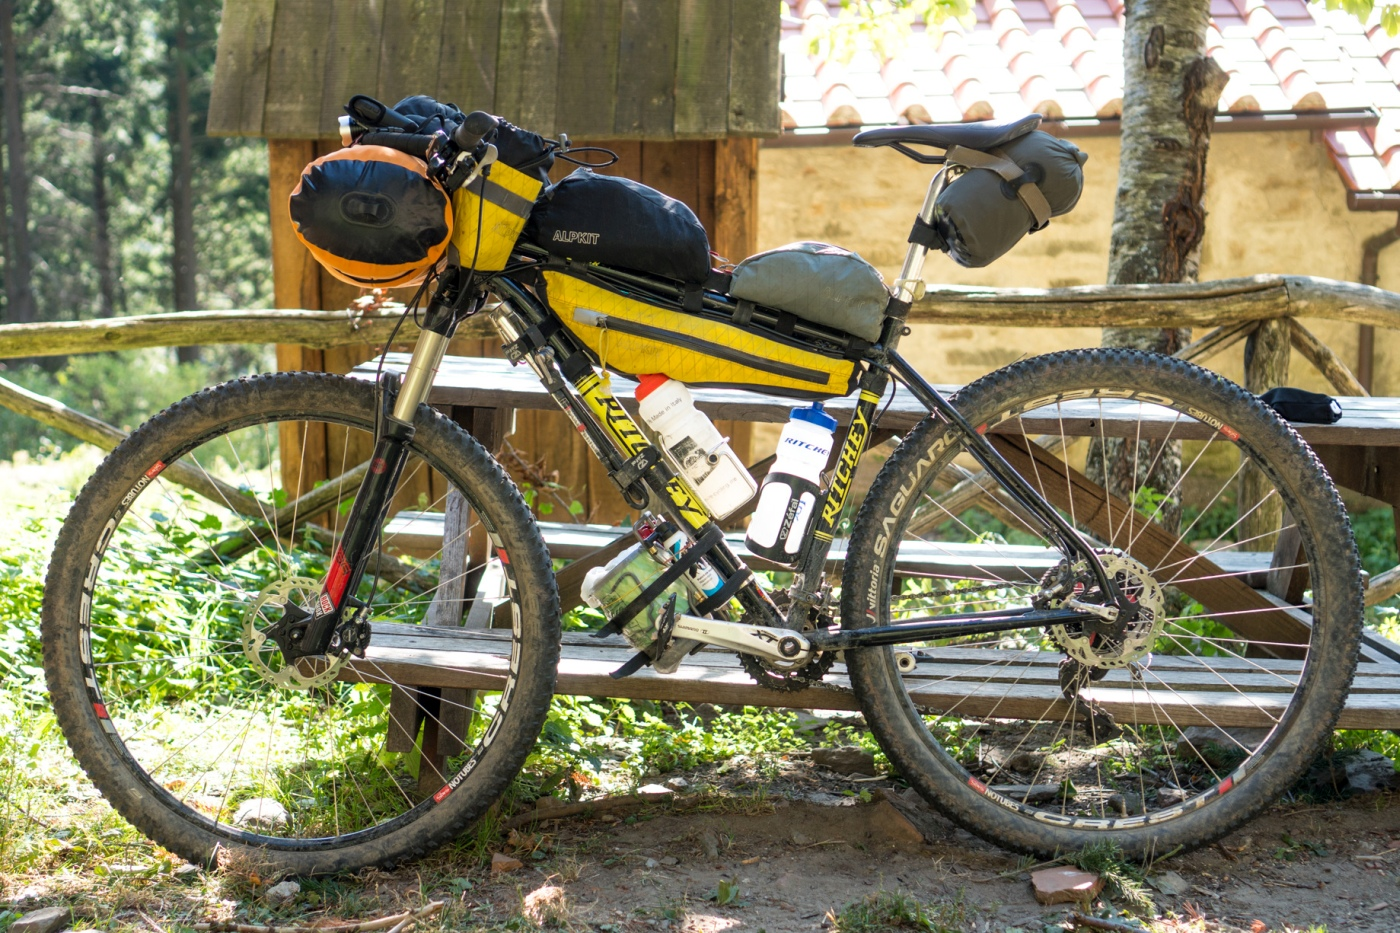 pratomagno_bikepacking-34